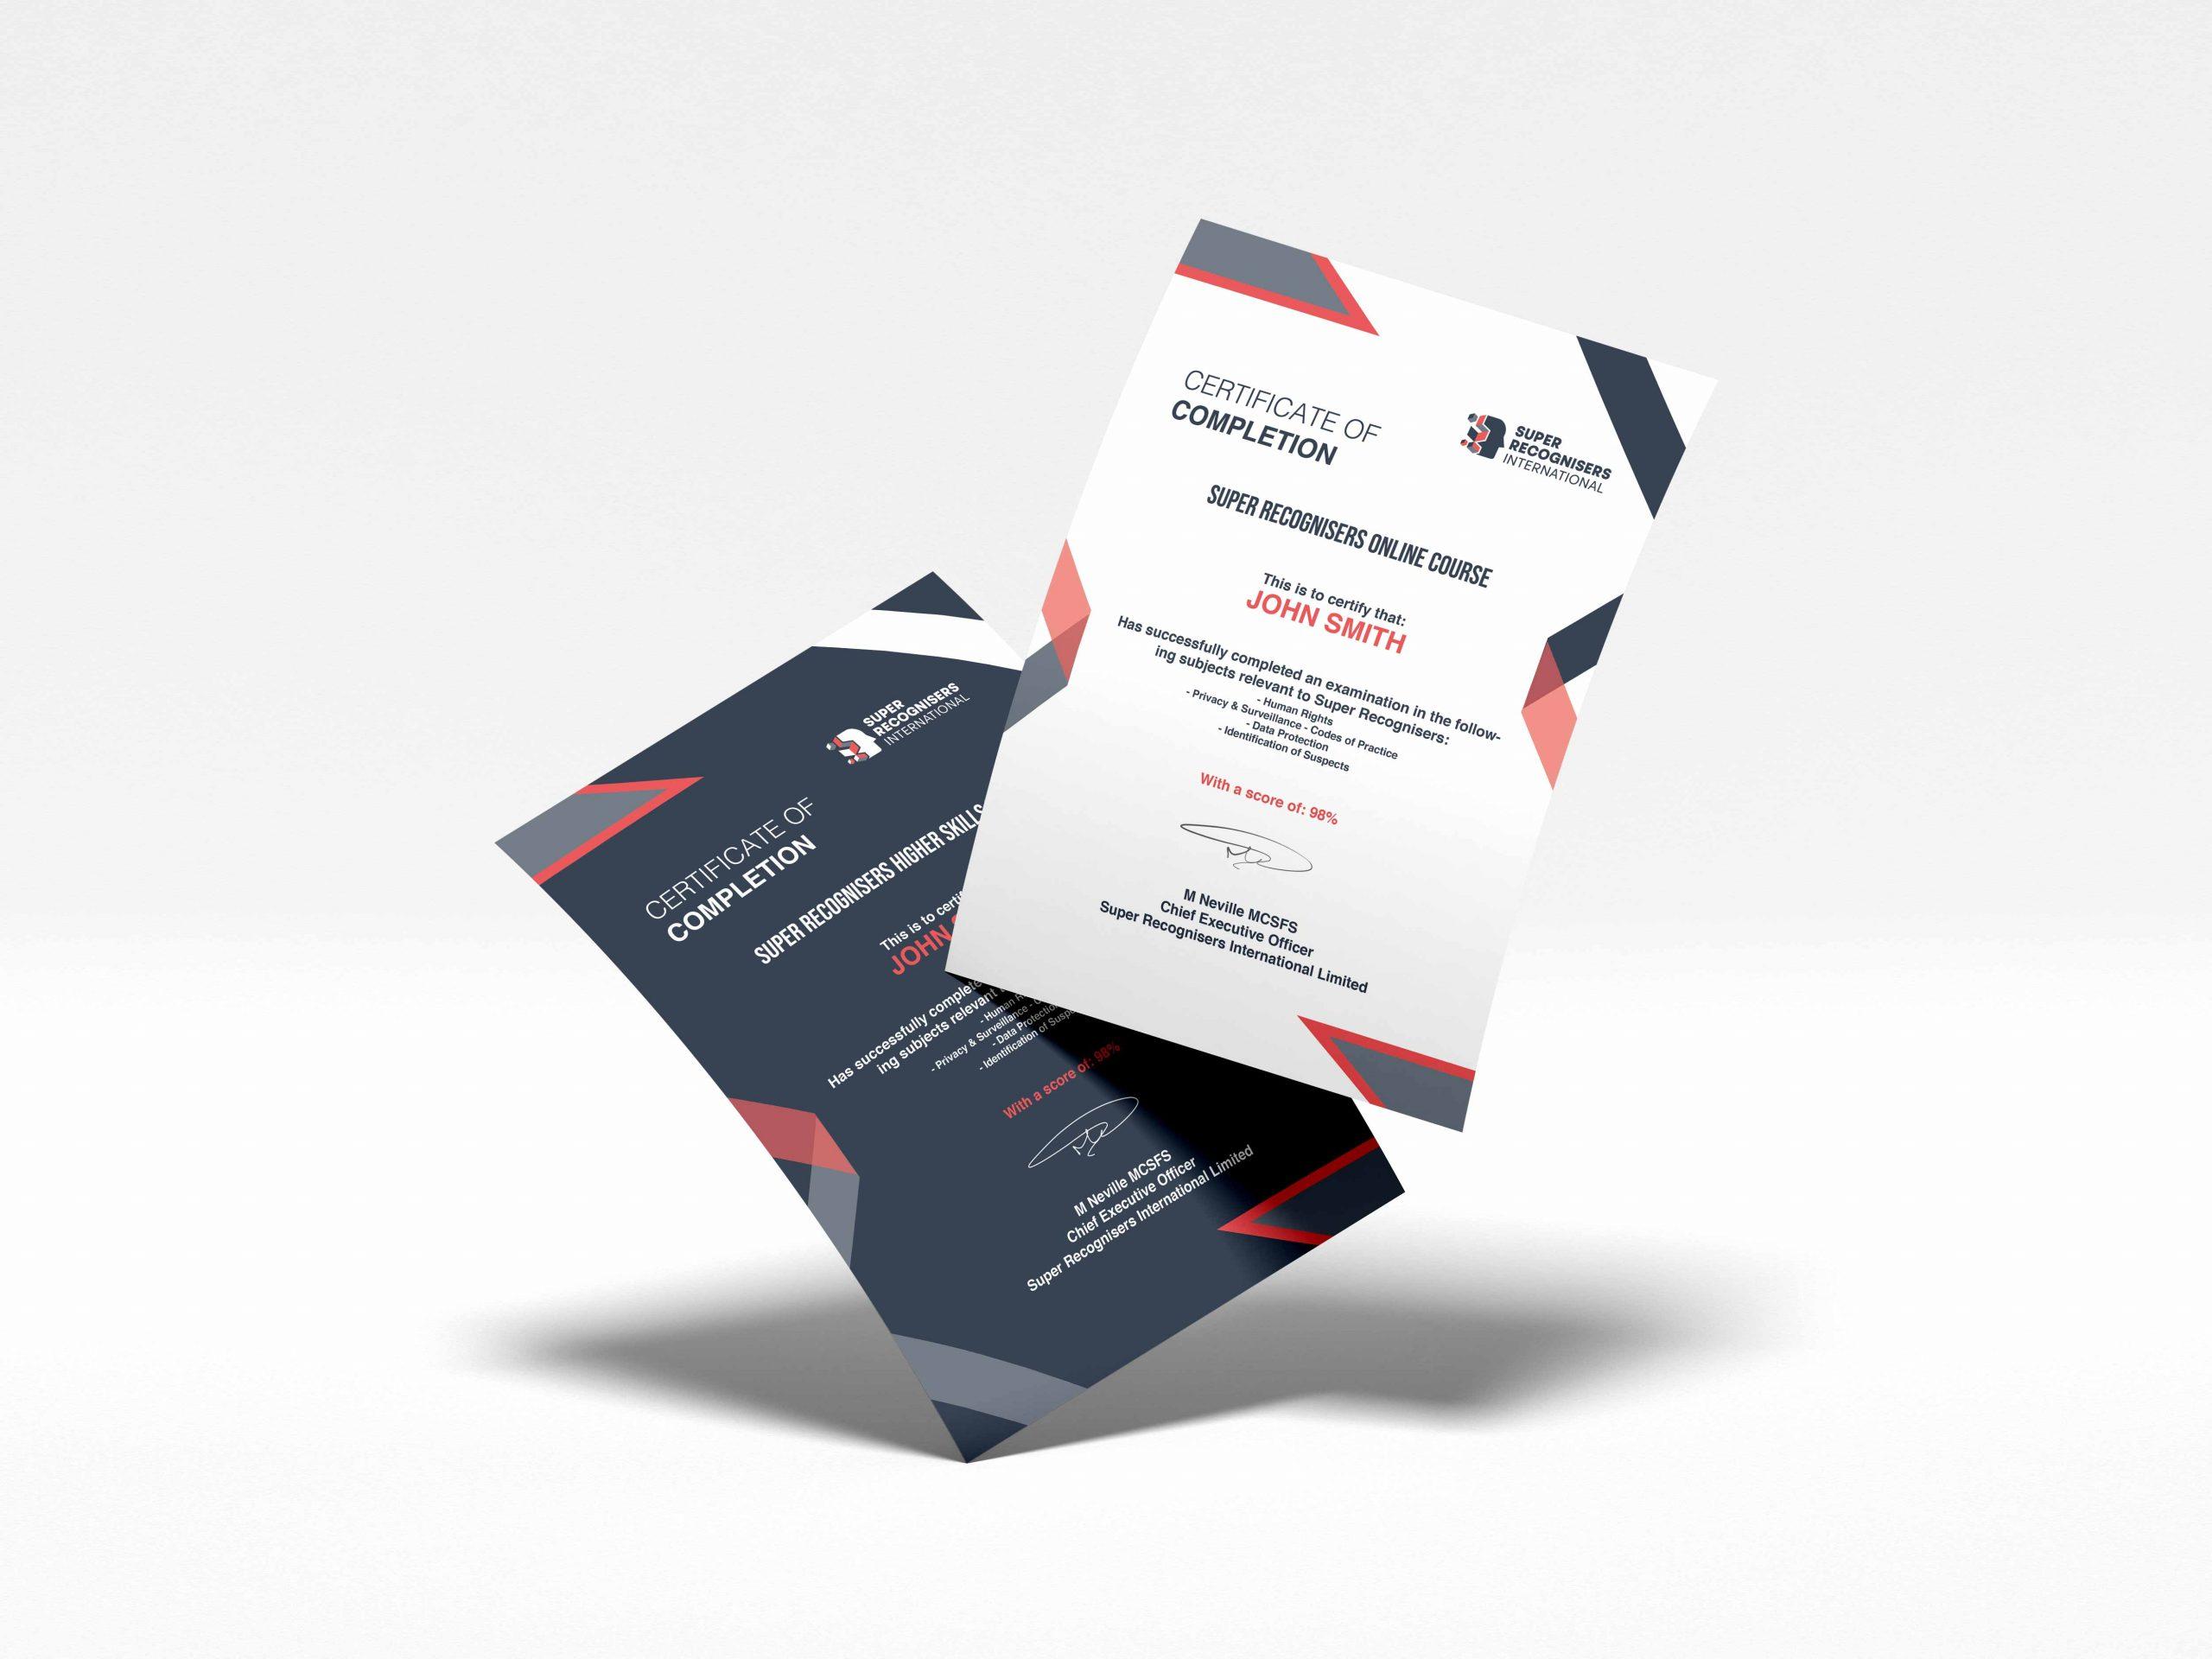 Course Certificates Super Recognisers International - Kent, England - Main background